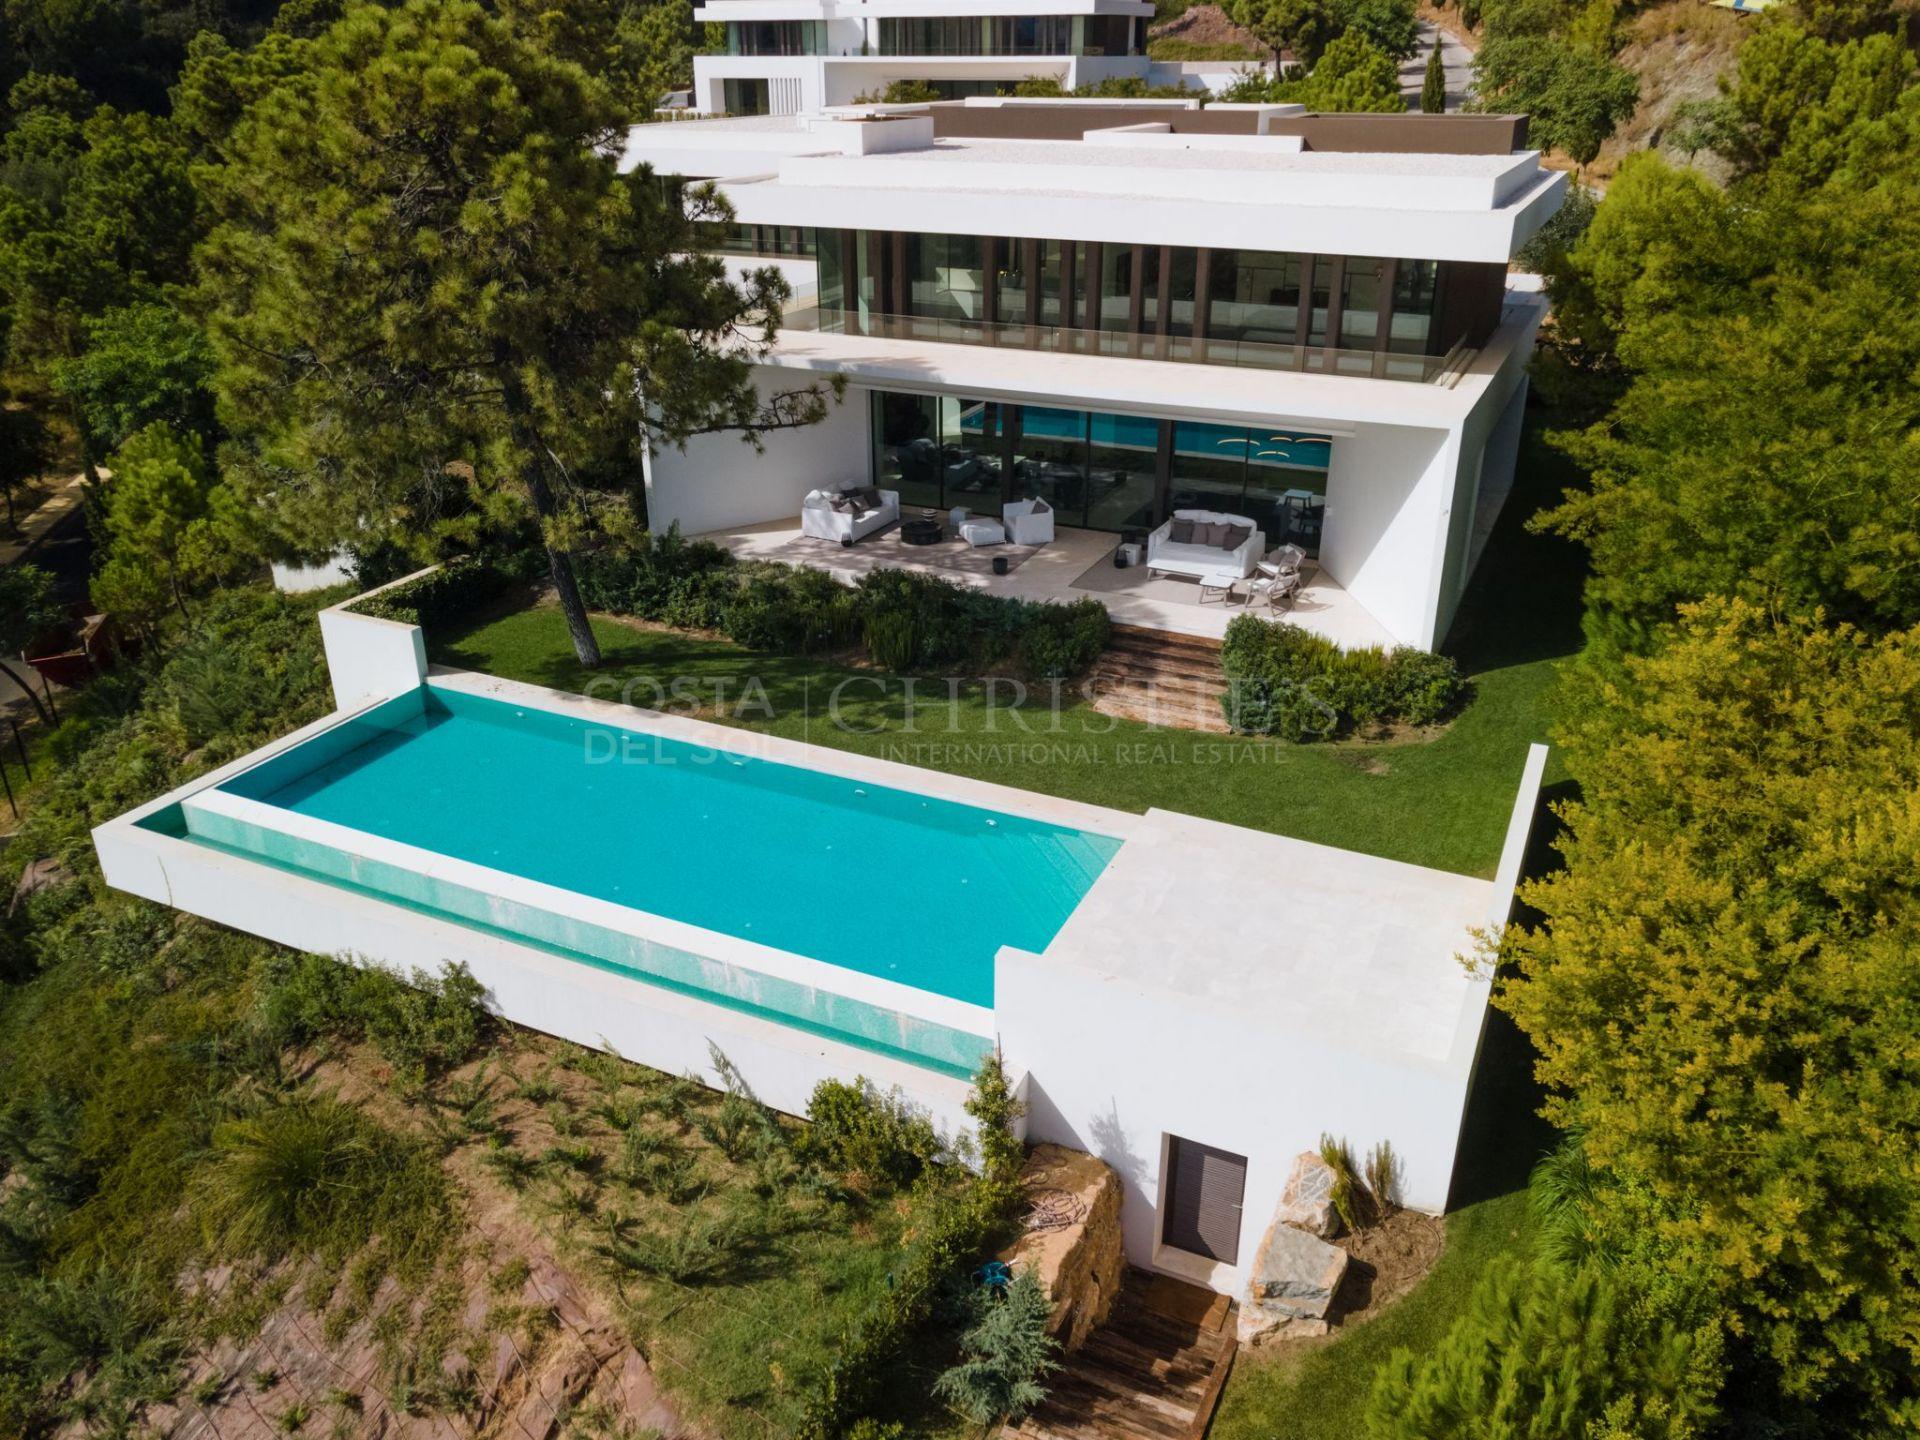 Majestic Villa 8 in La Reserva de Alcuzcuz, Benahavis | Christie's International Real Estate